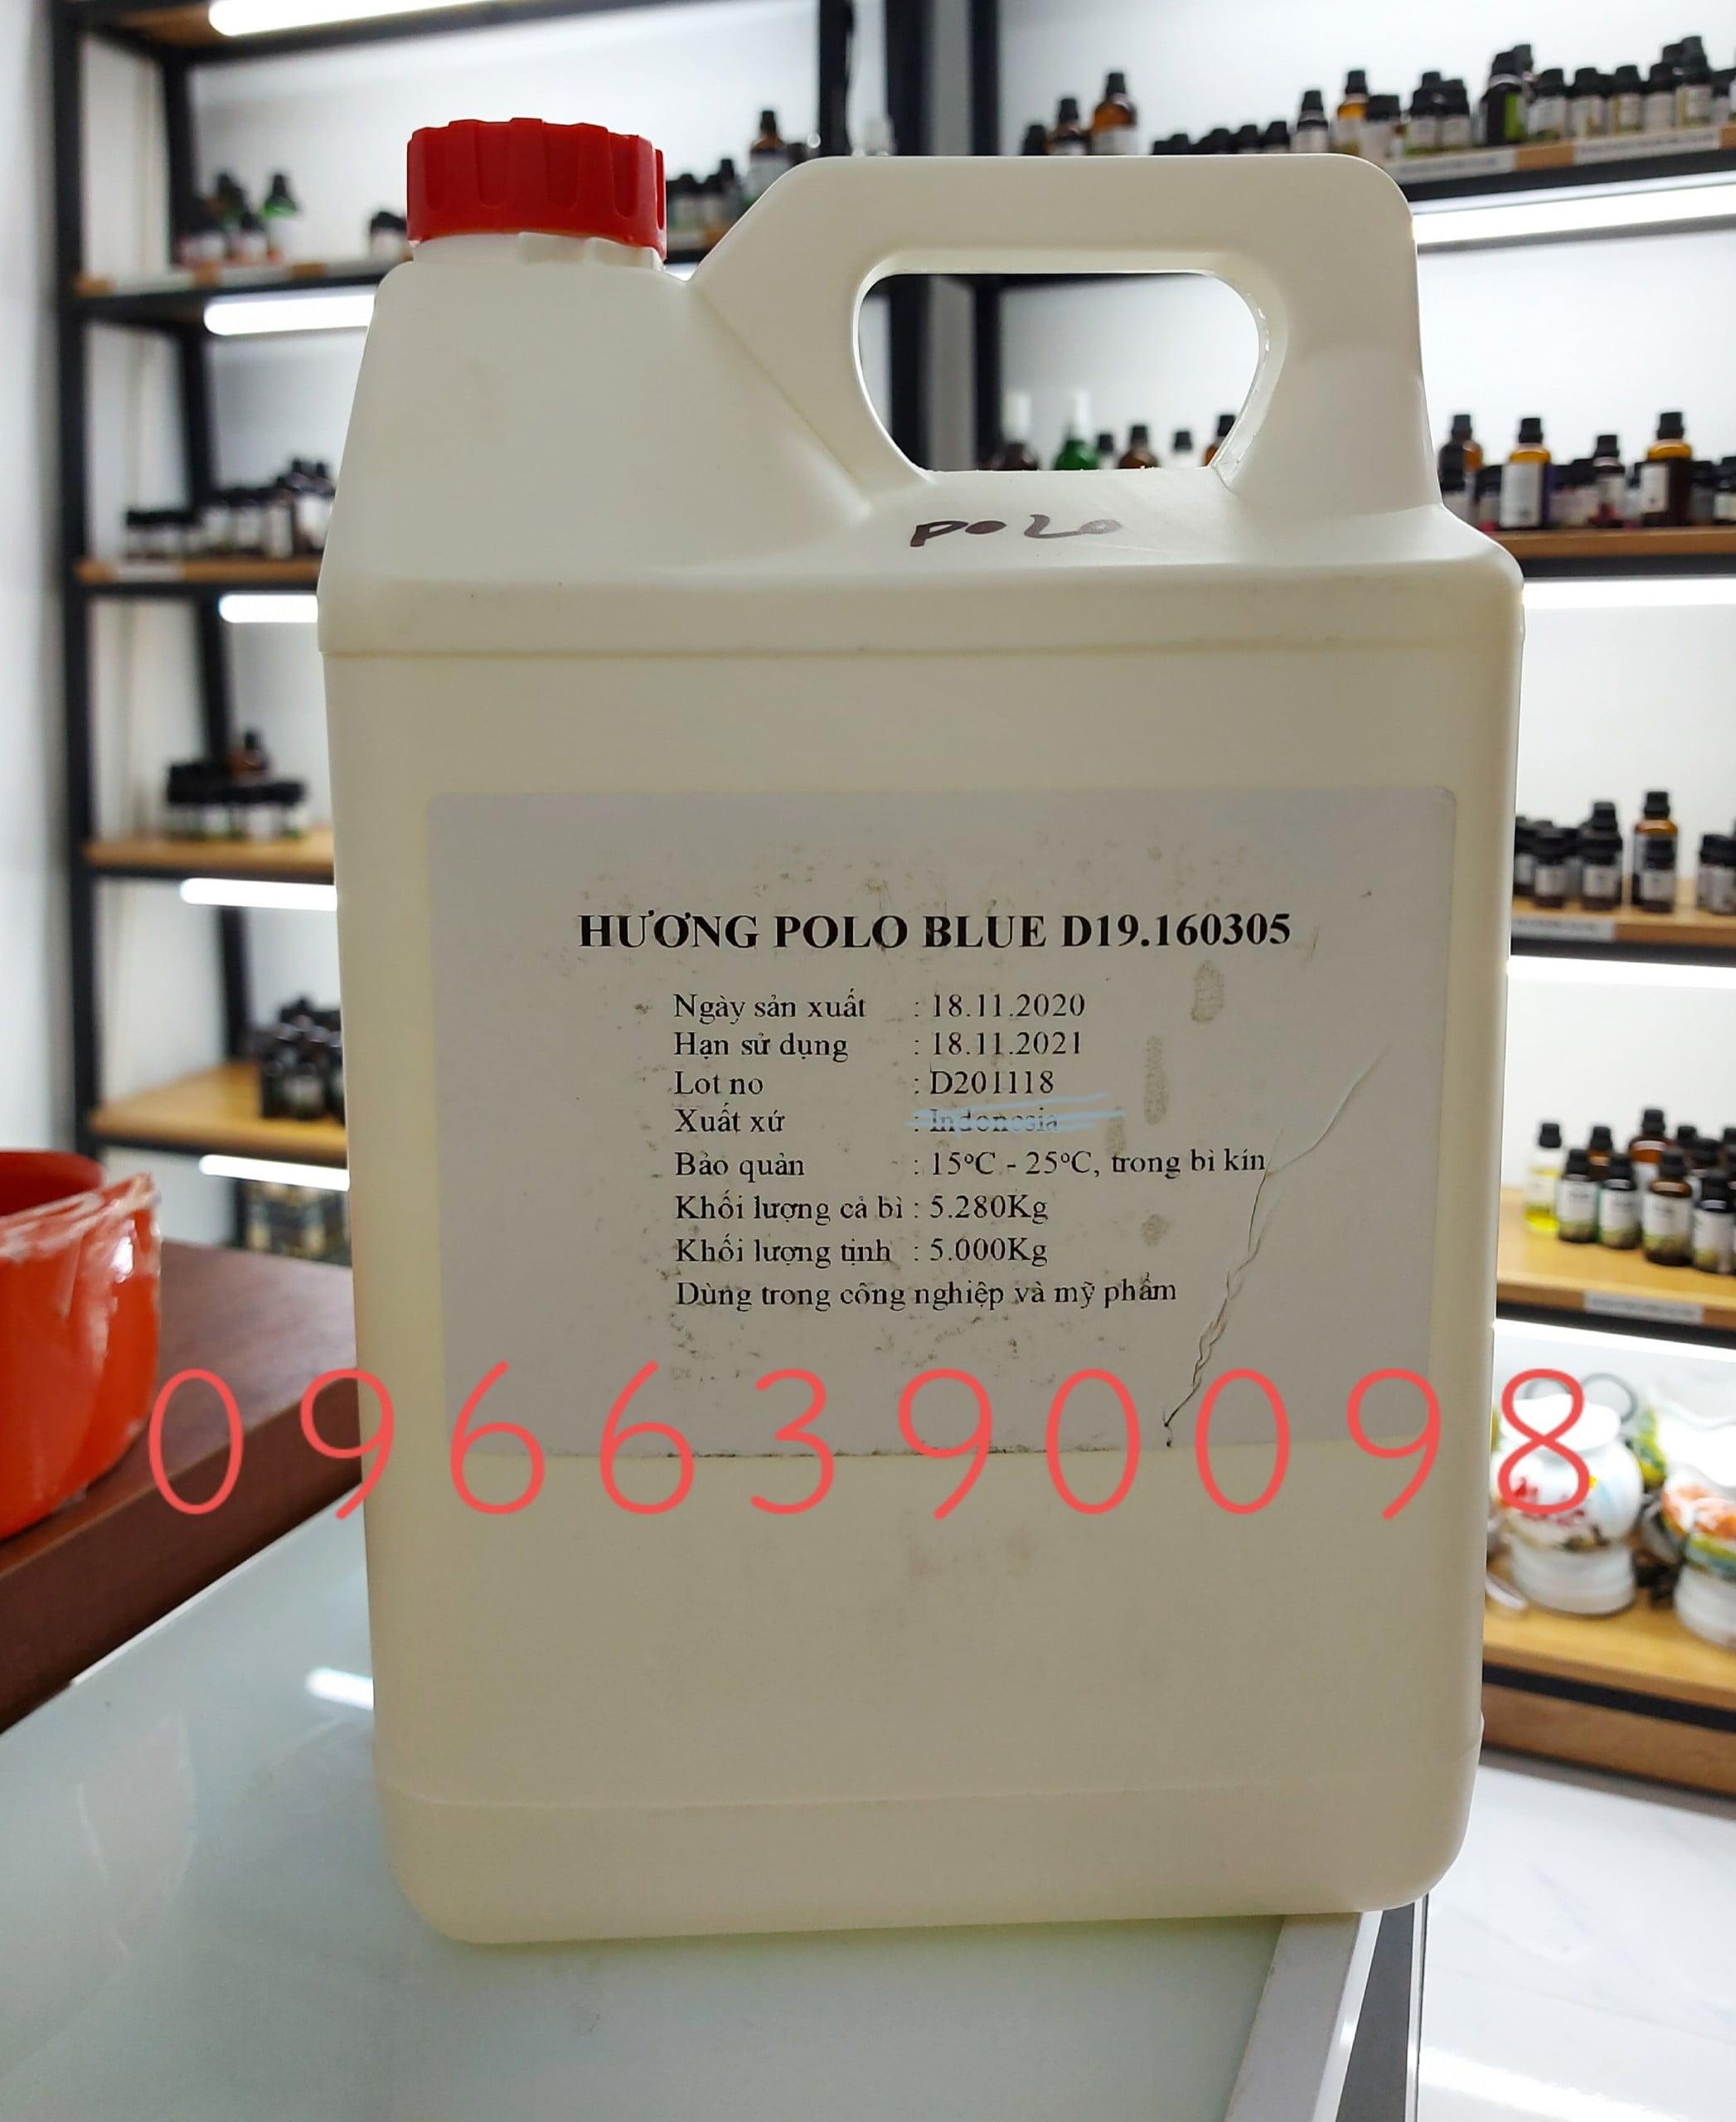 Sỉ hương mỹ phẩm PhoLo can 5L